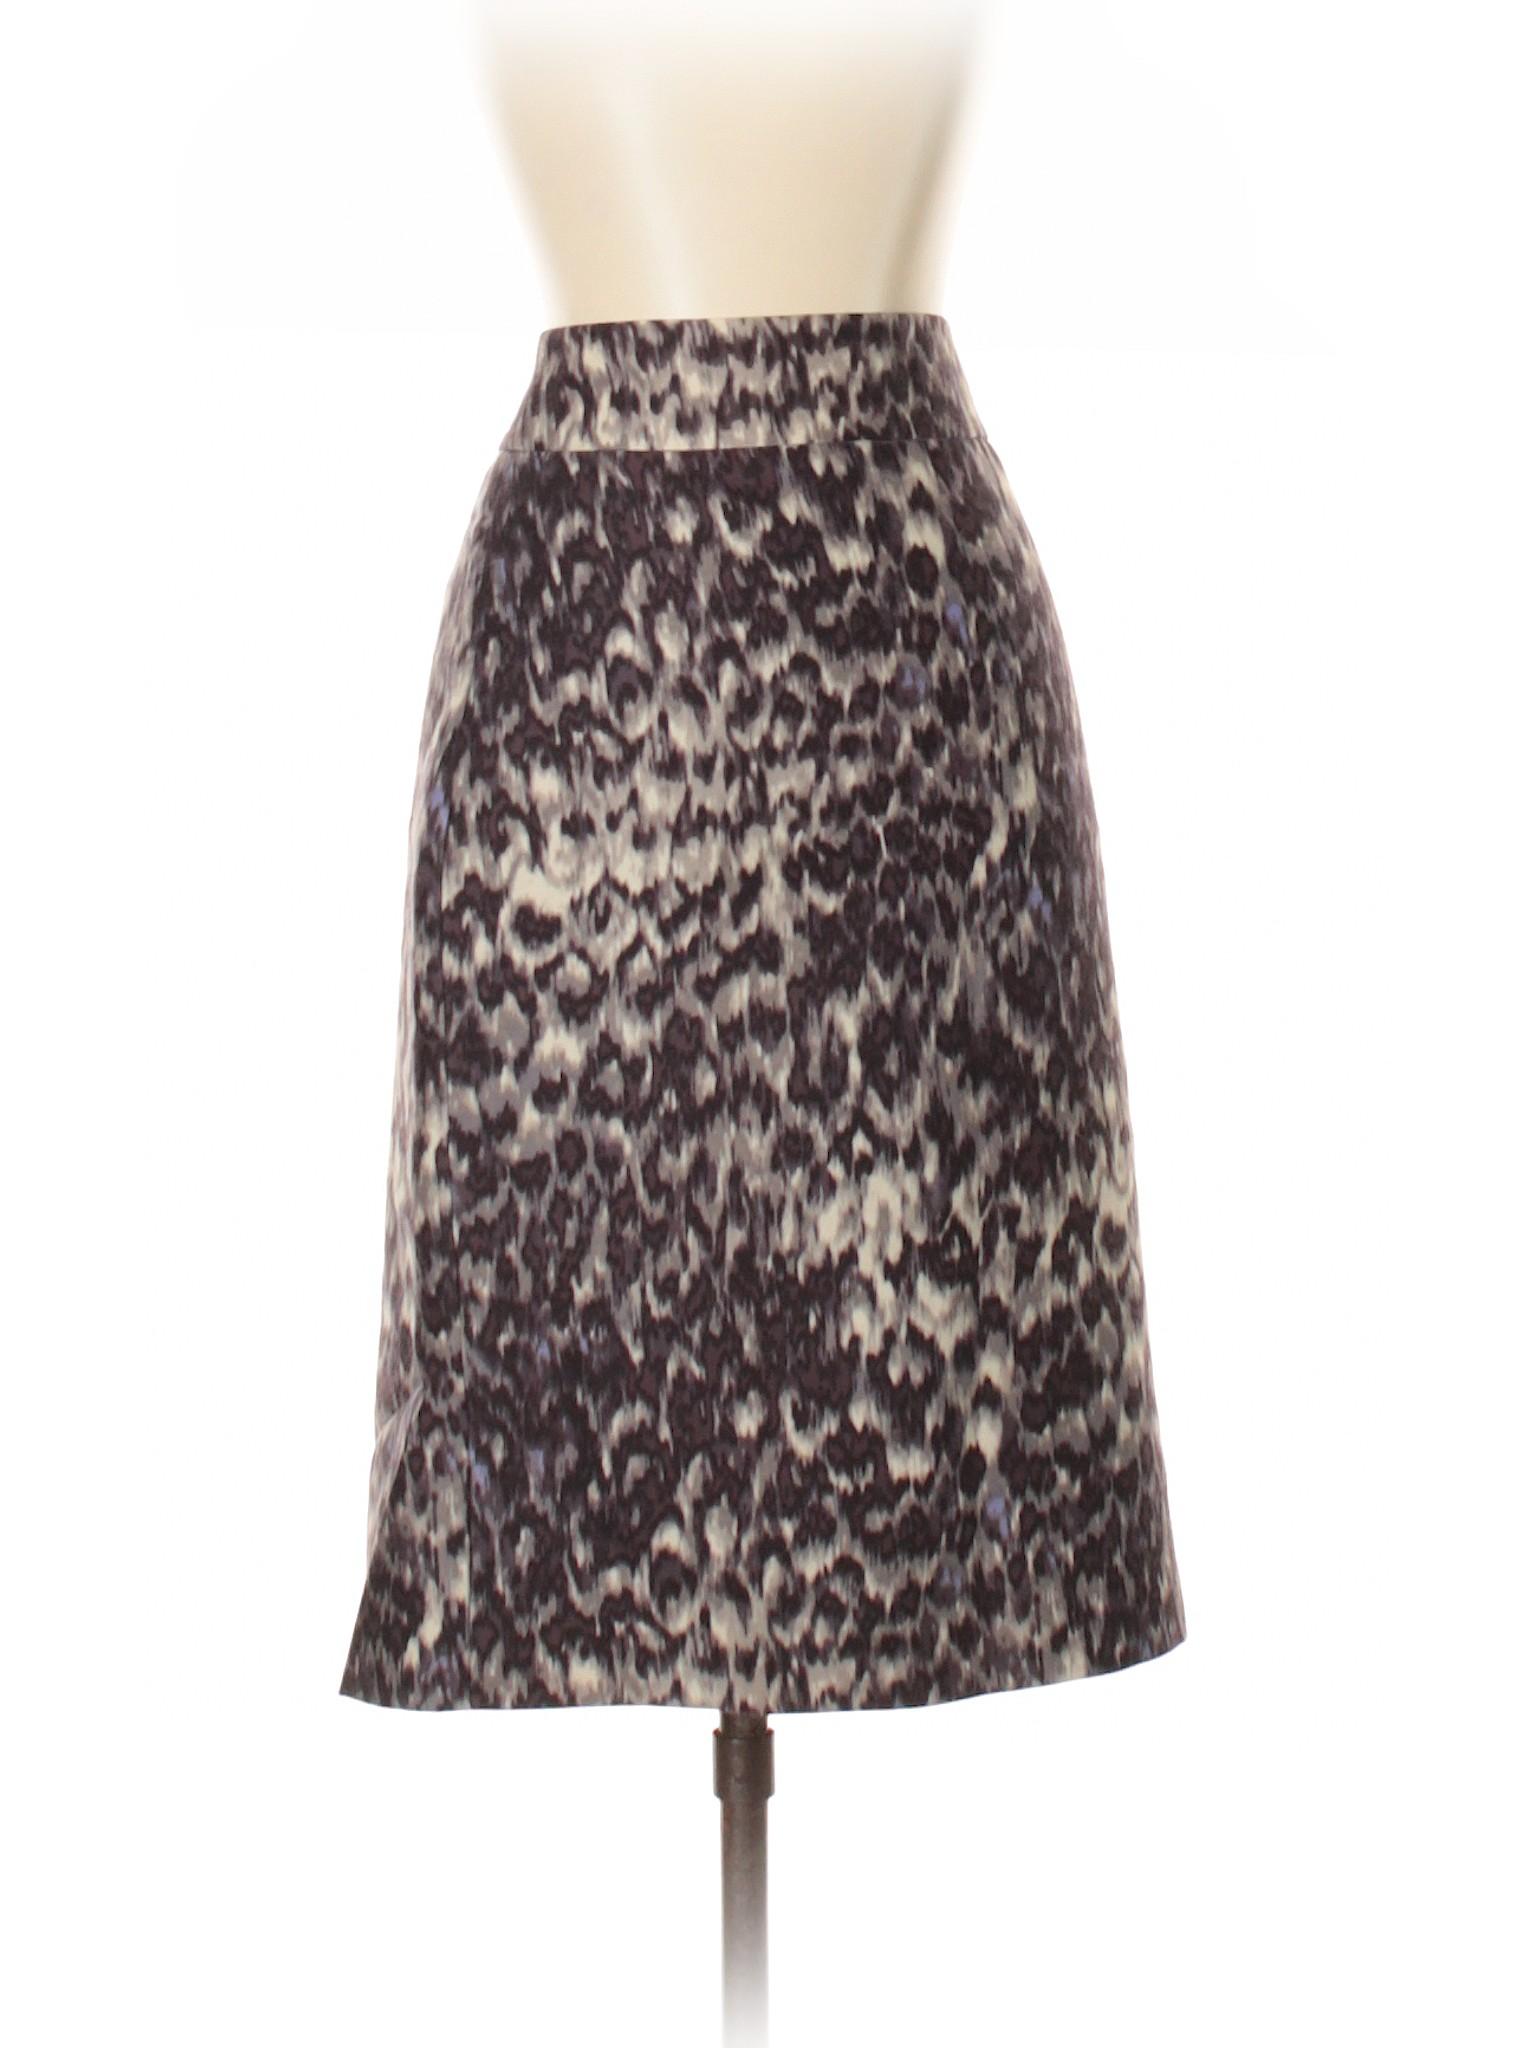 Boutique Wool Crew J Skirt leisure Hwqr1Hx7t